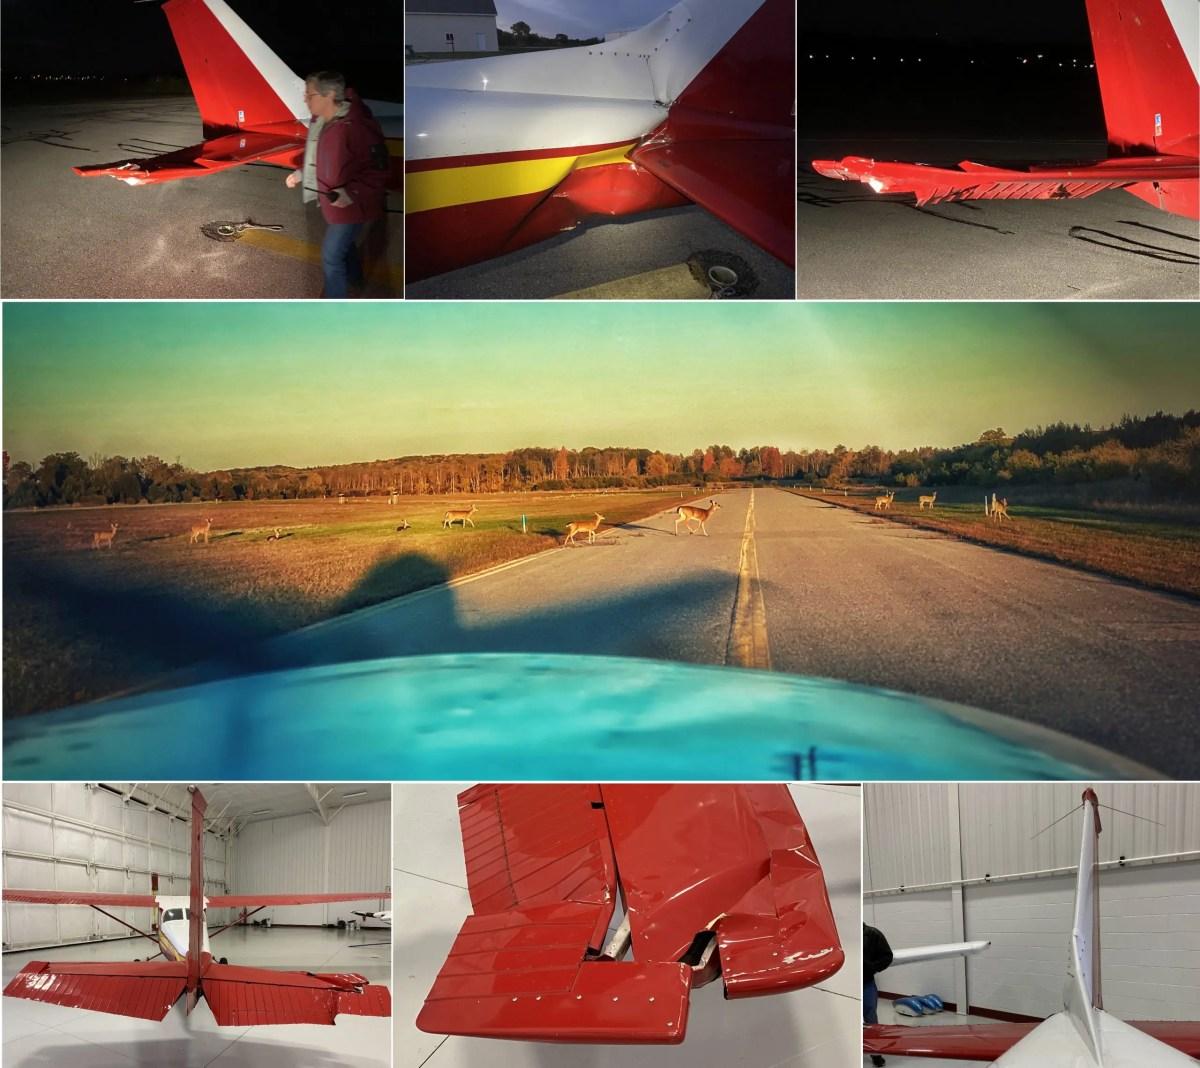 The Broken Airplane